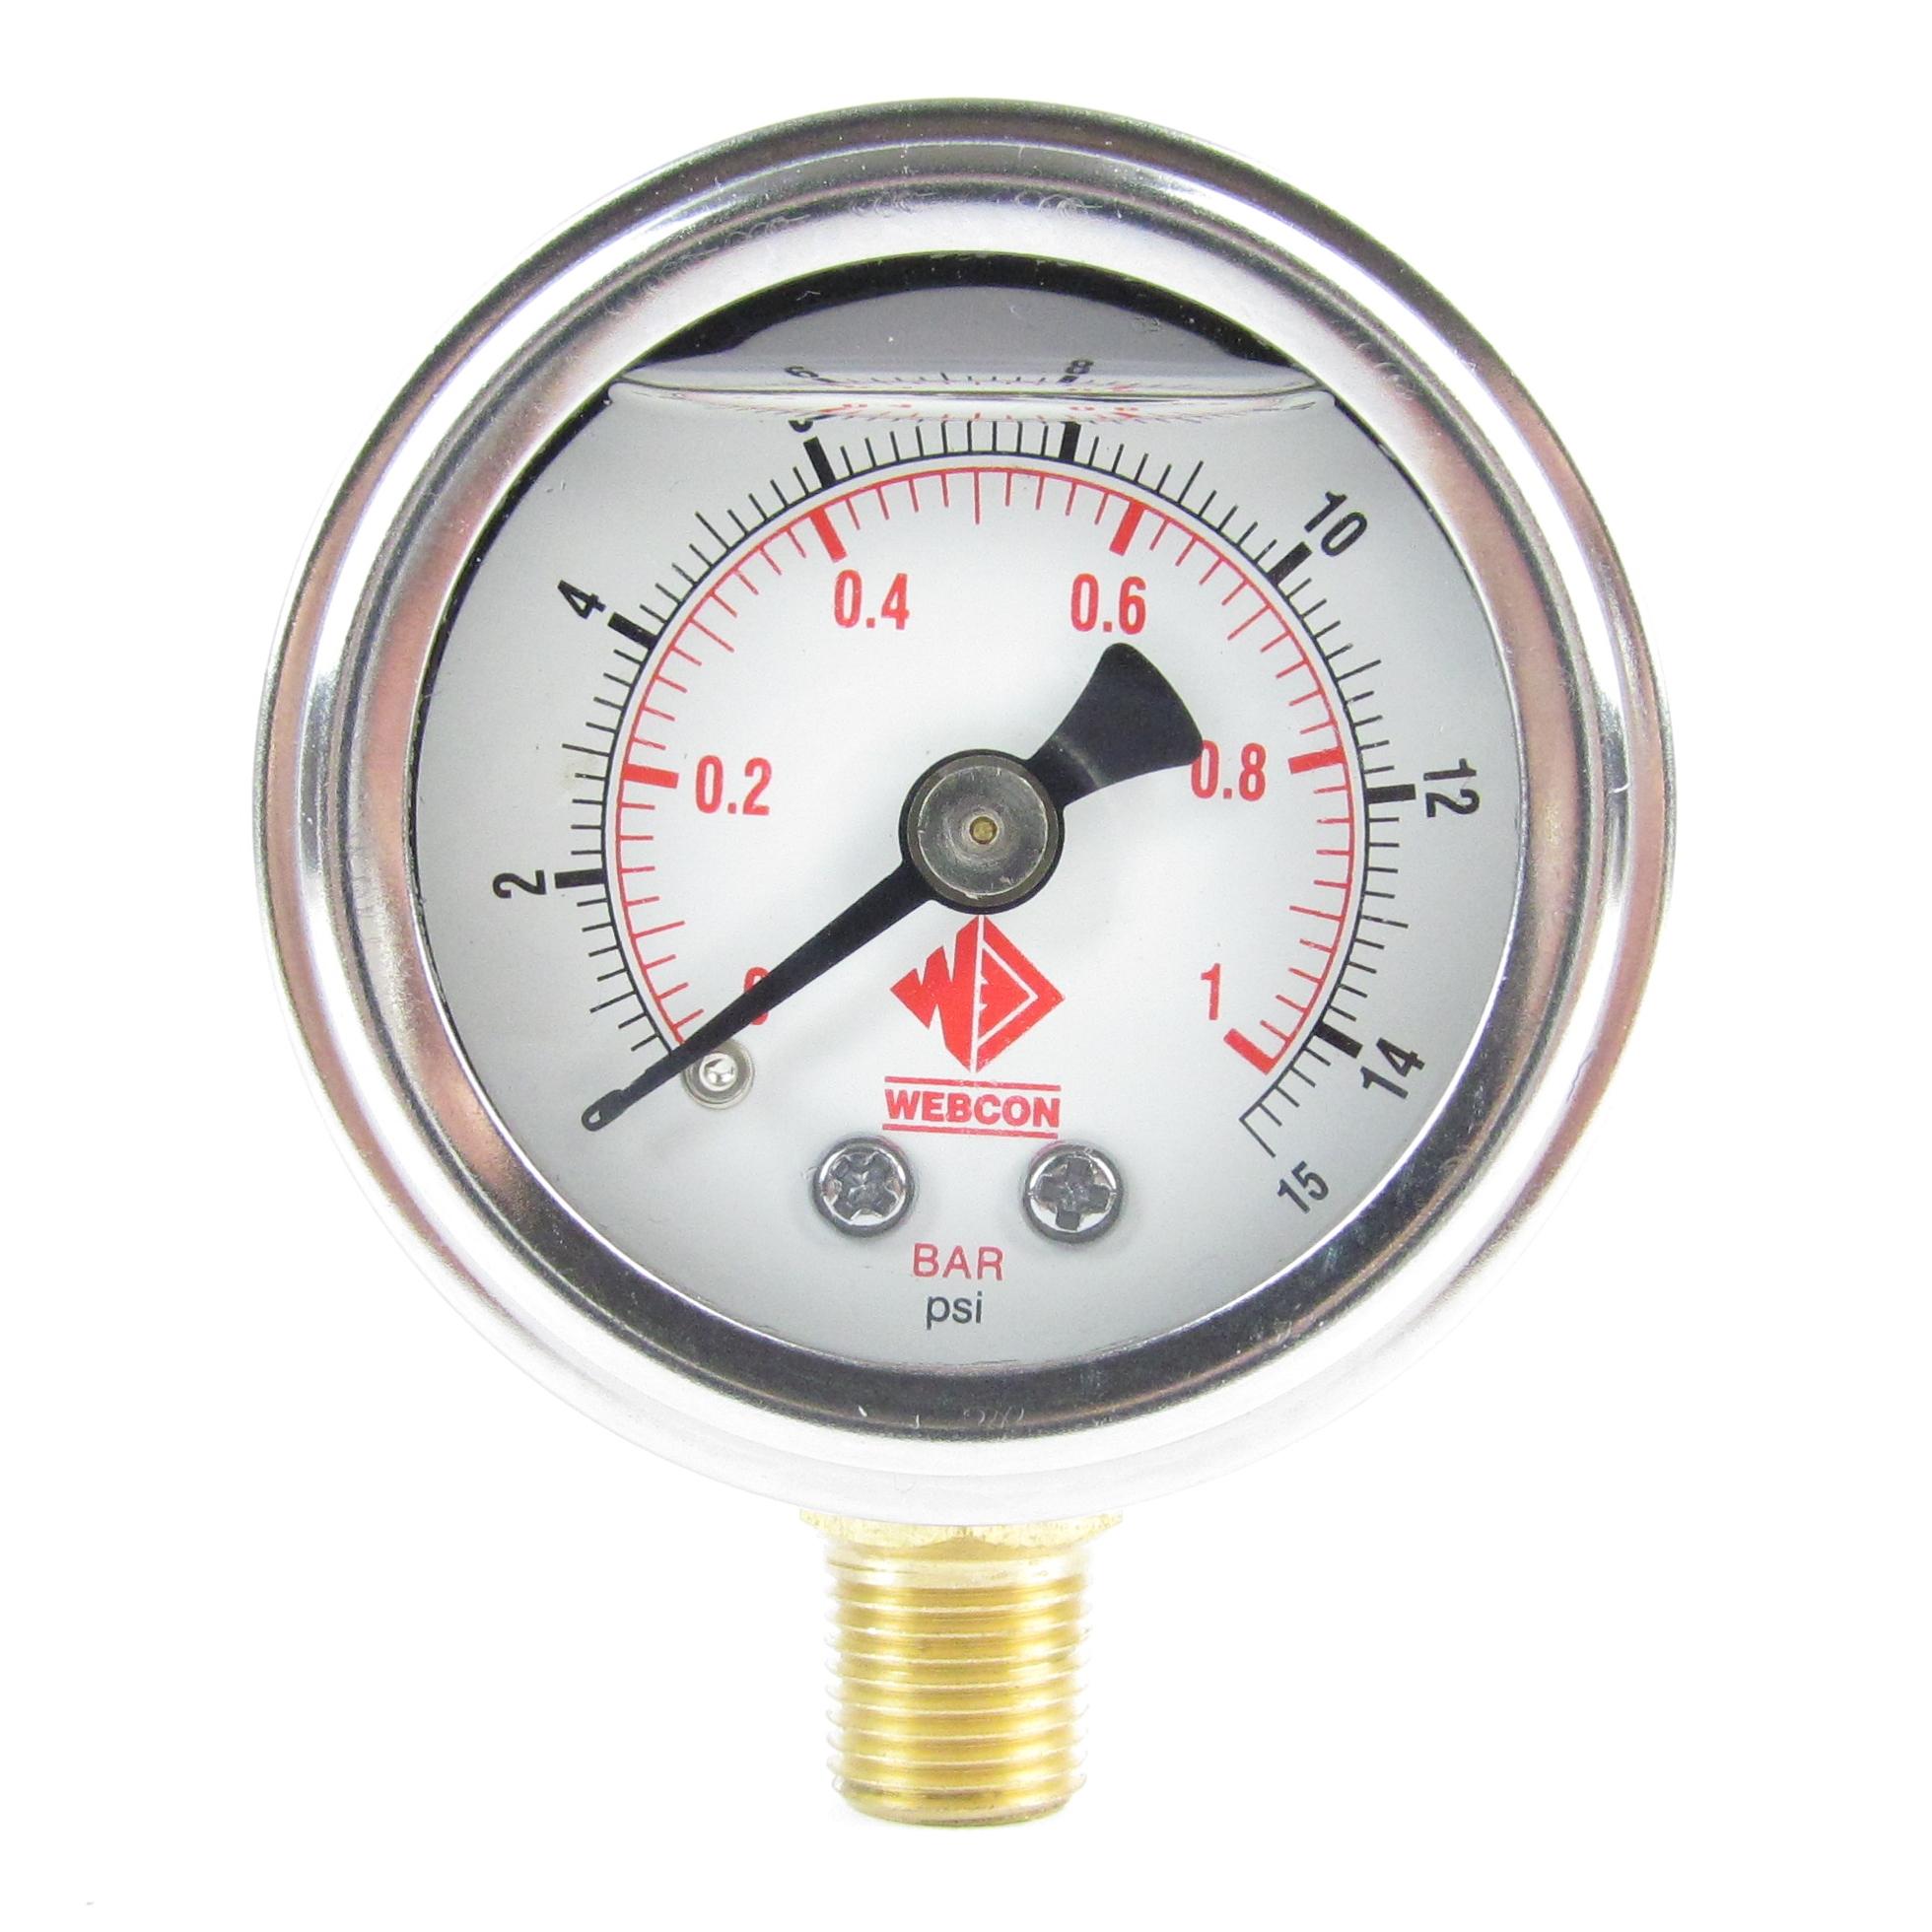 Wfr webcon fuel pressure gauge psi eurocarb